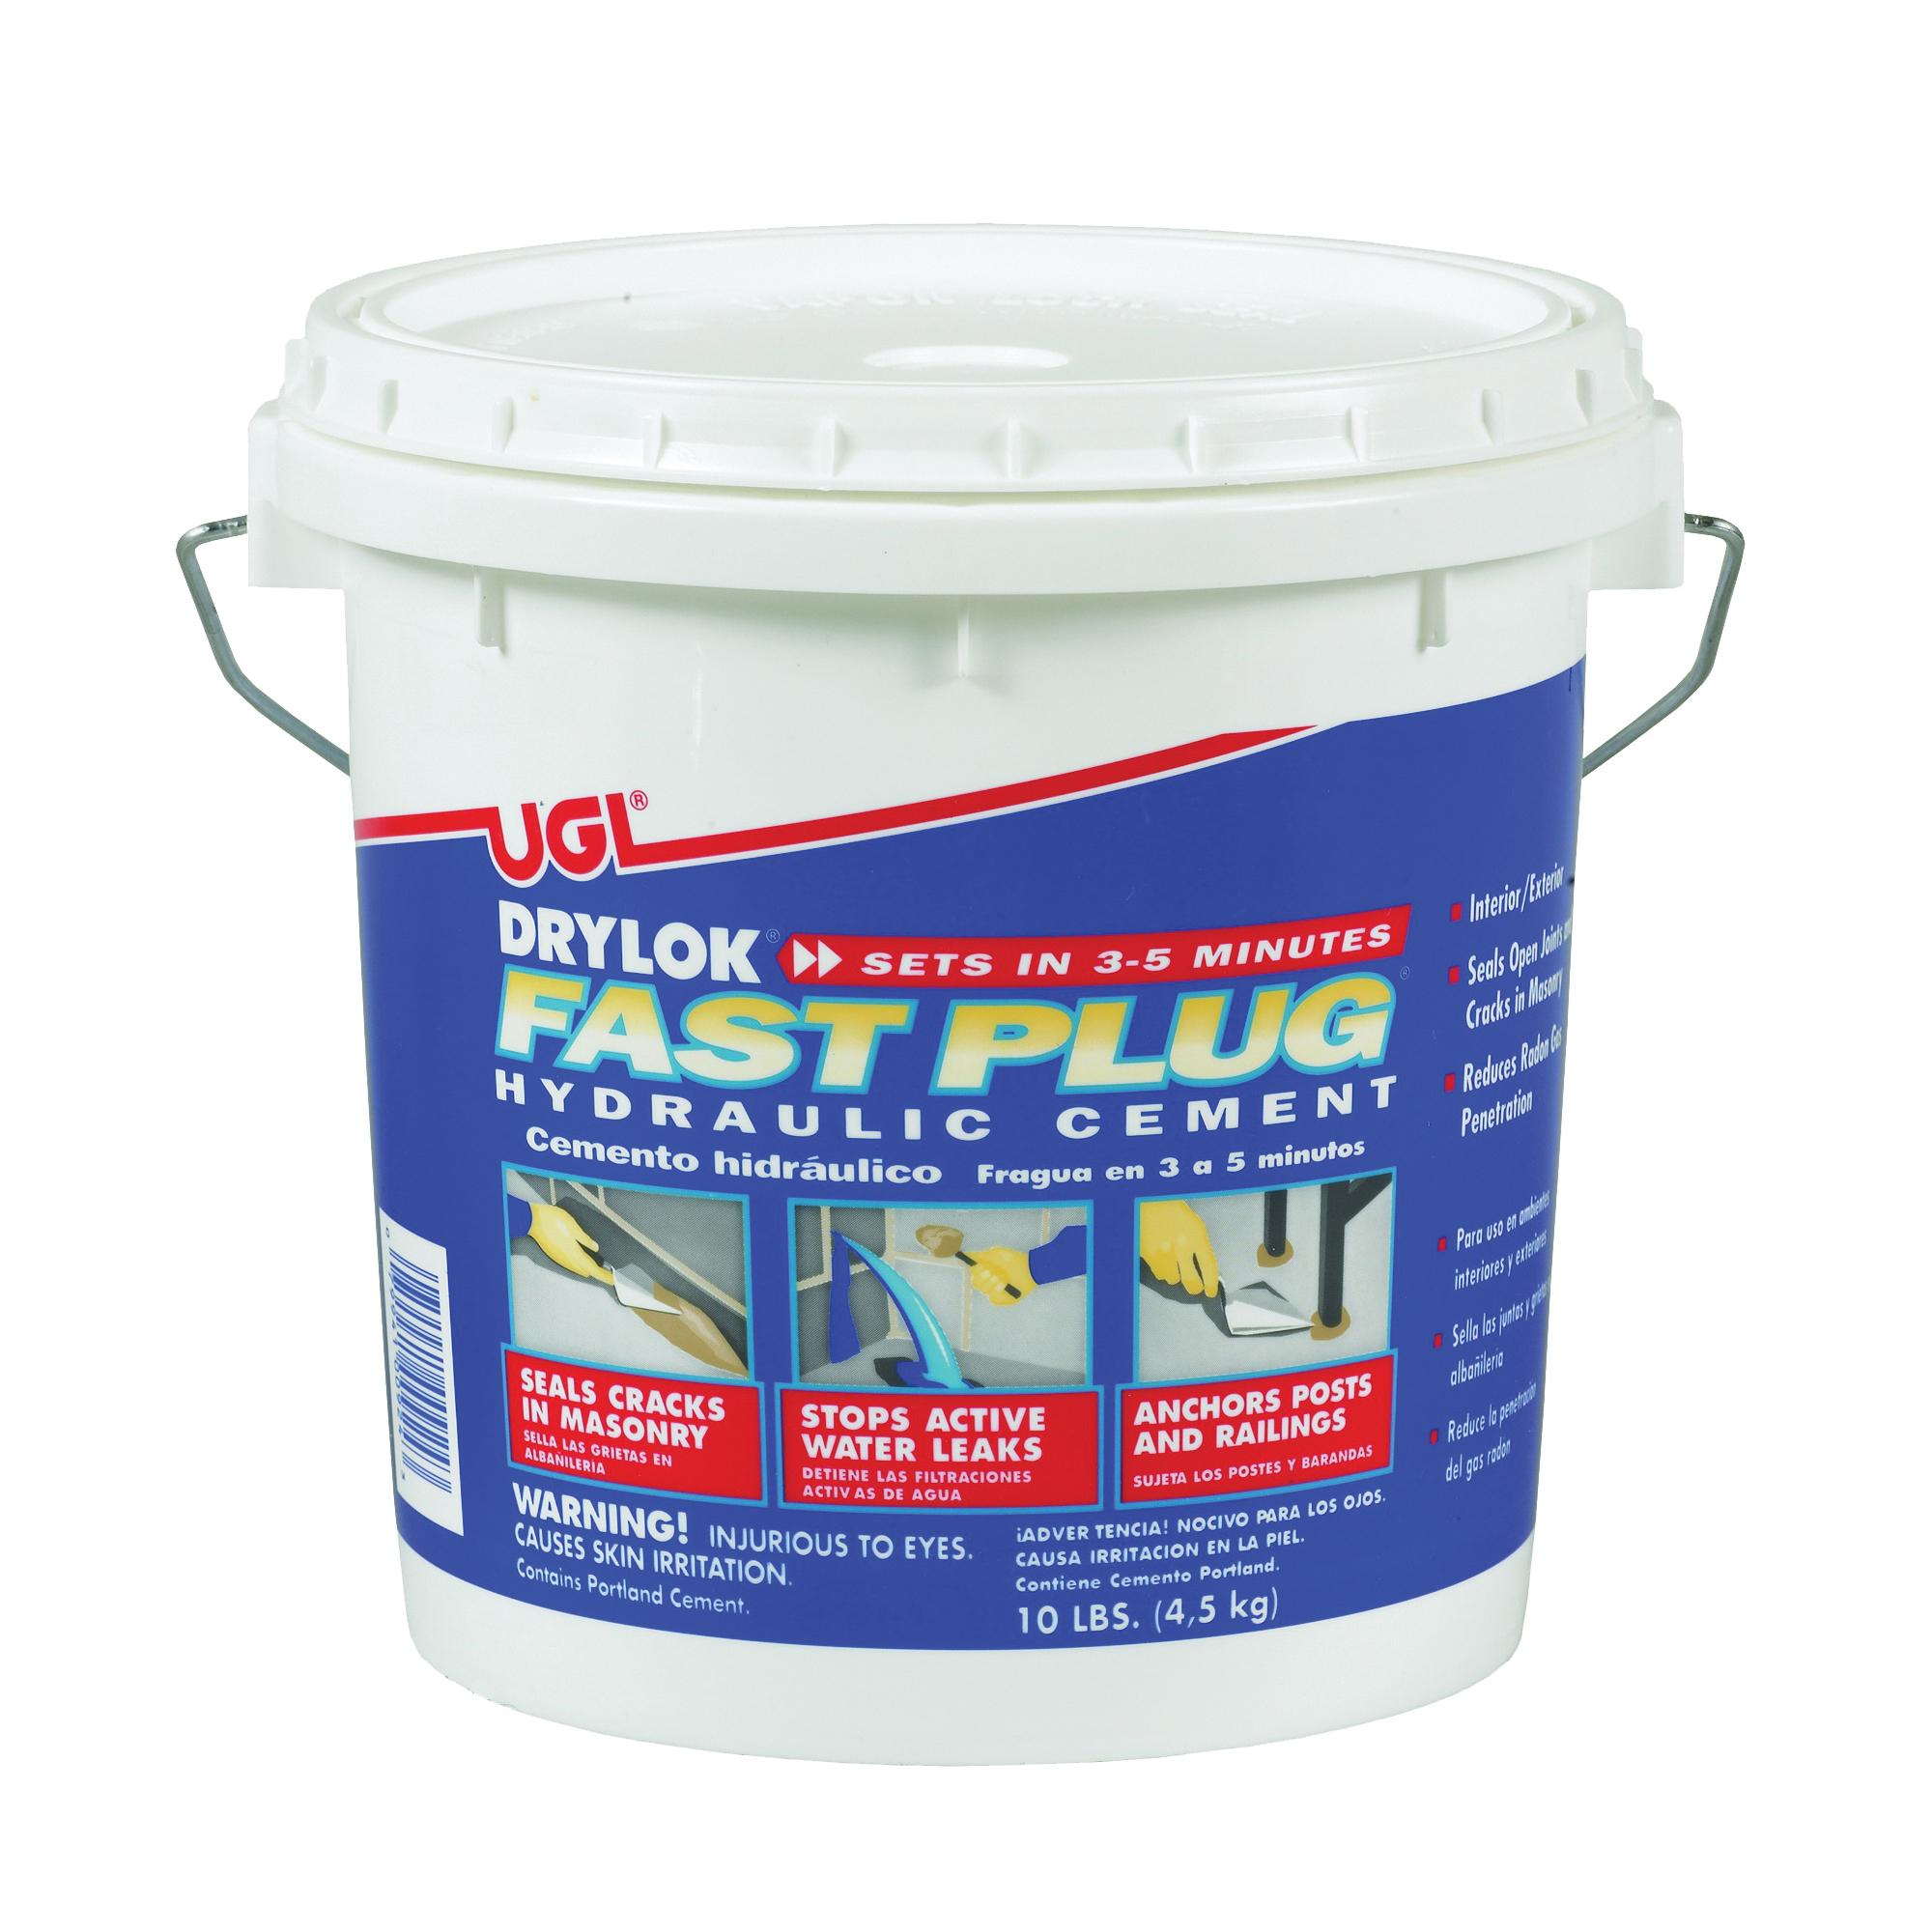 Picture of UGL DRYLOK Fast Plug 00924 Hydraulic Cement, Gray, Powder, 10 lb Package